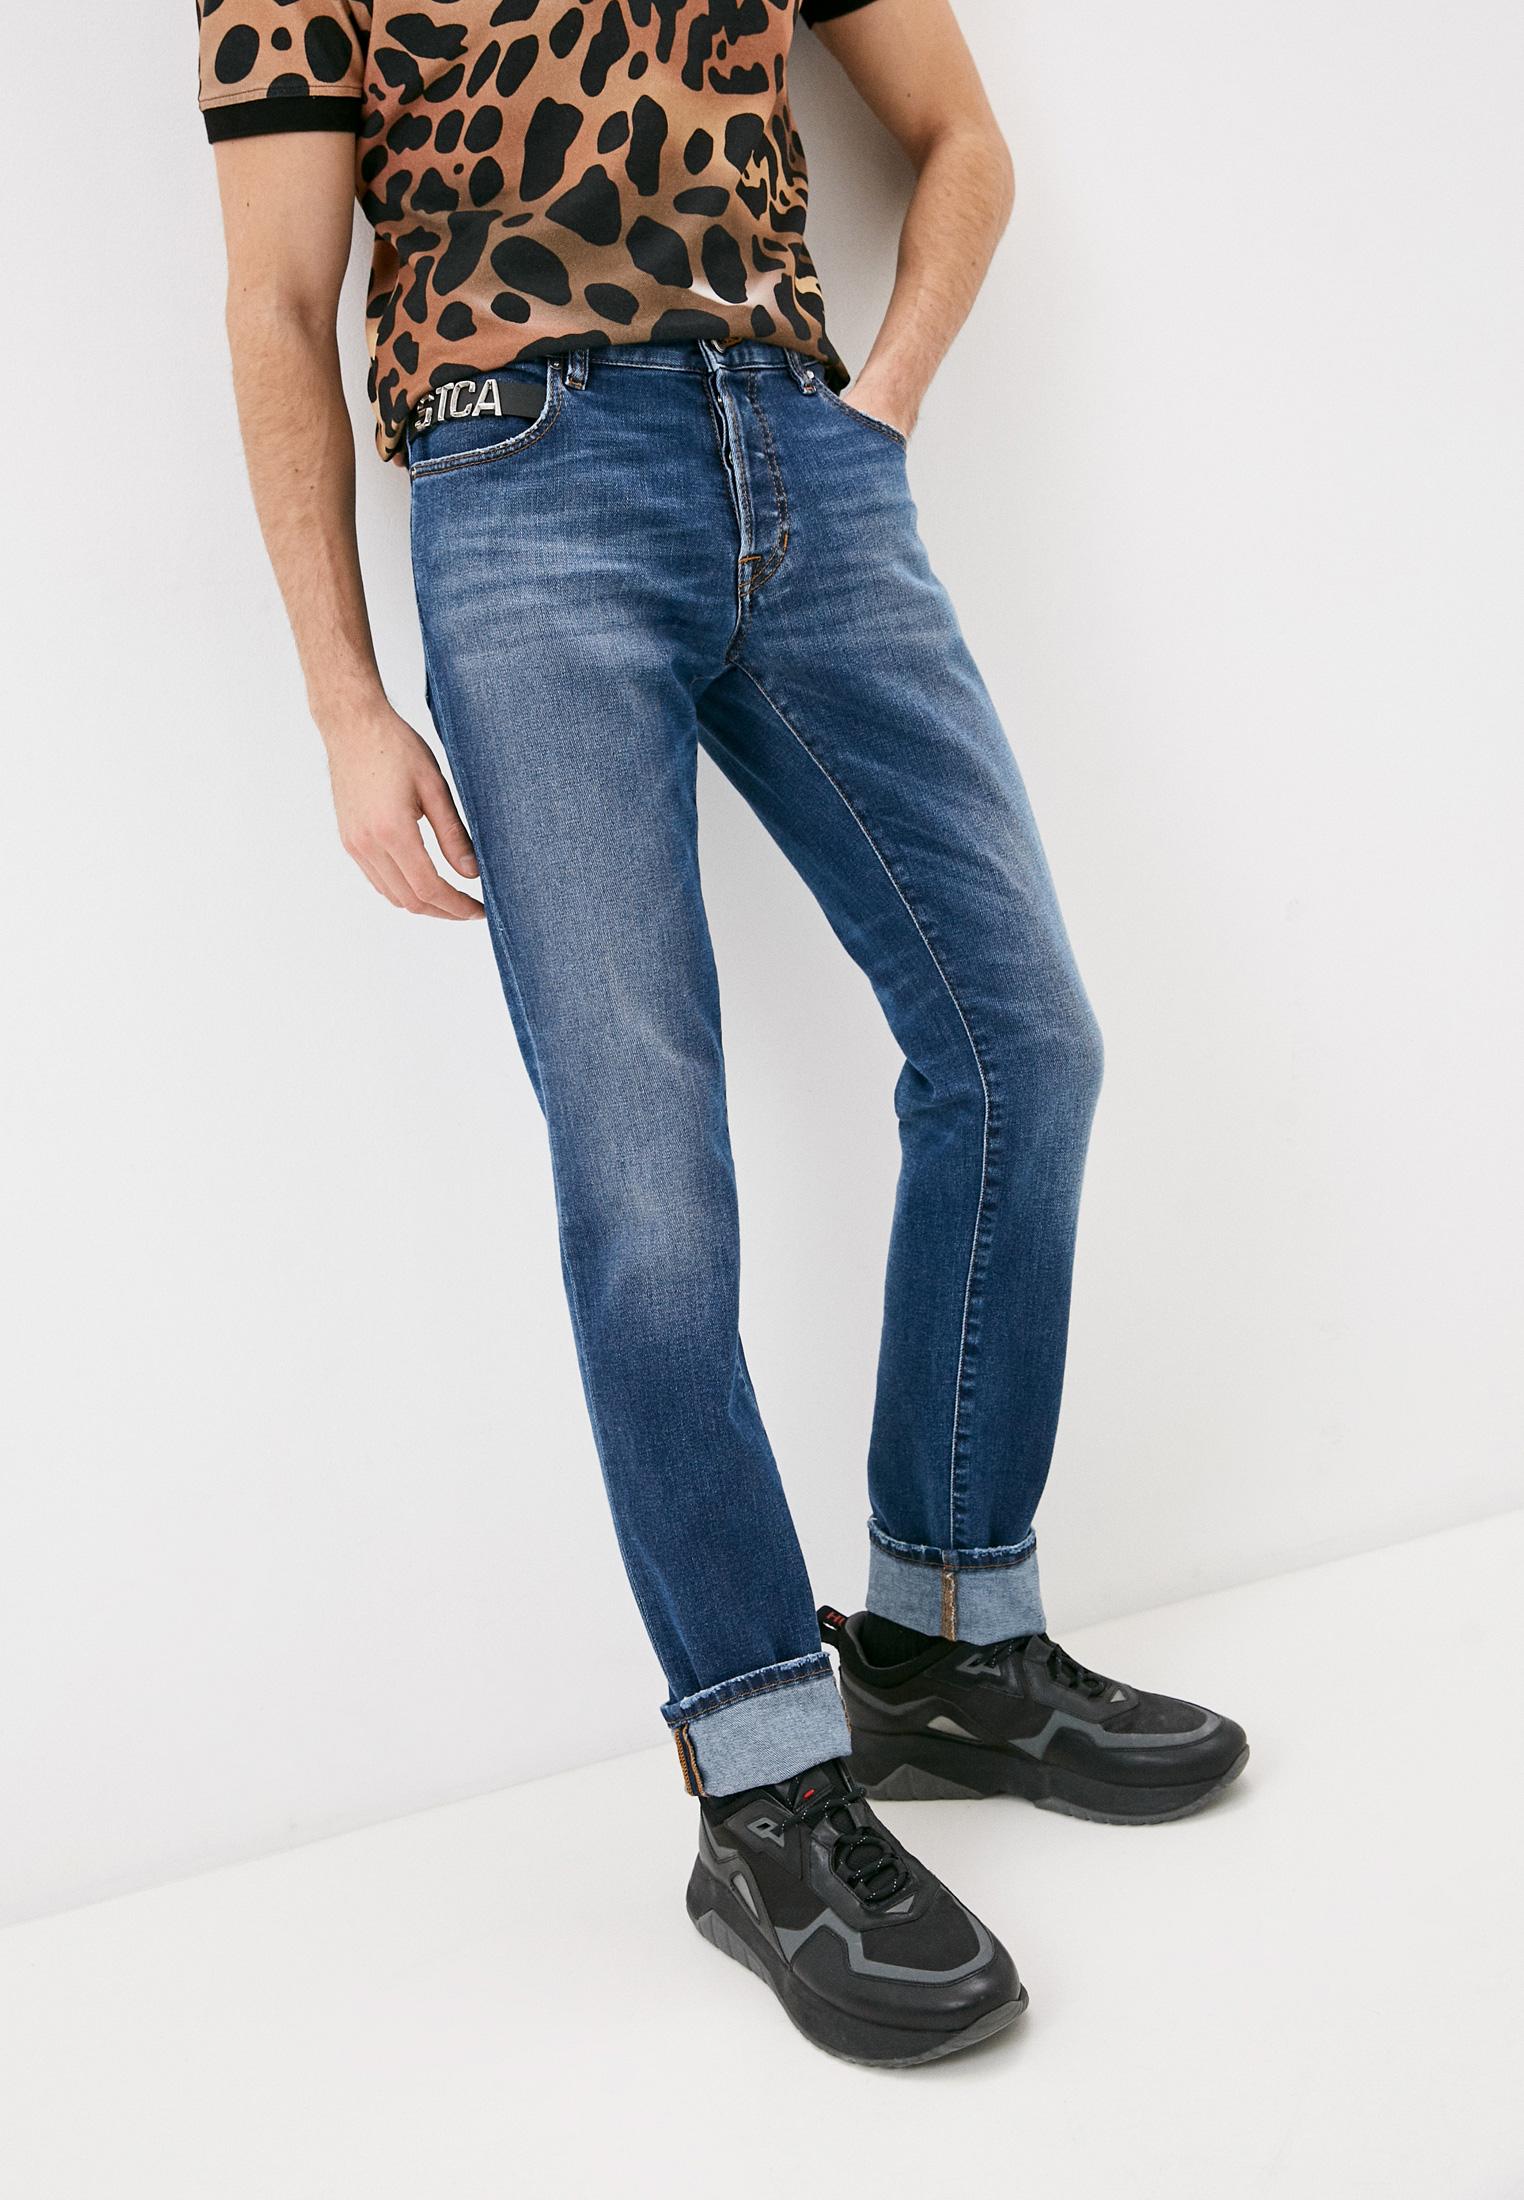 Зауженные джинсы Just Cavalli (Джаст Кавалли) S01LA0141N31882